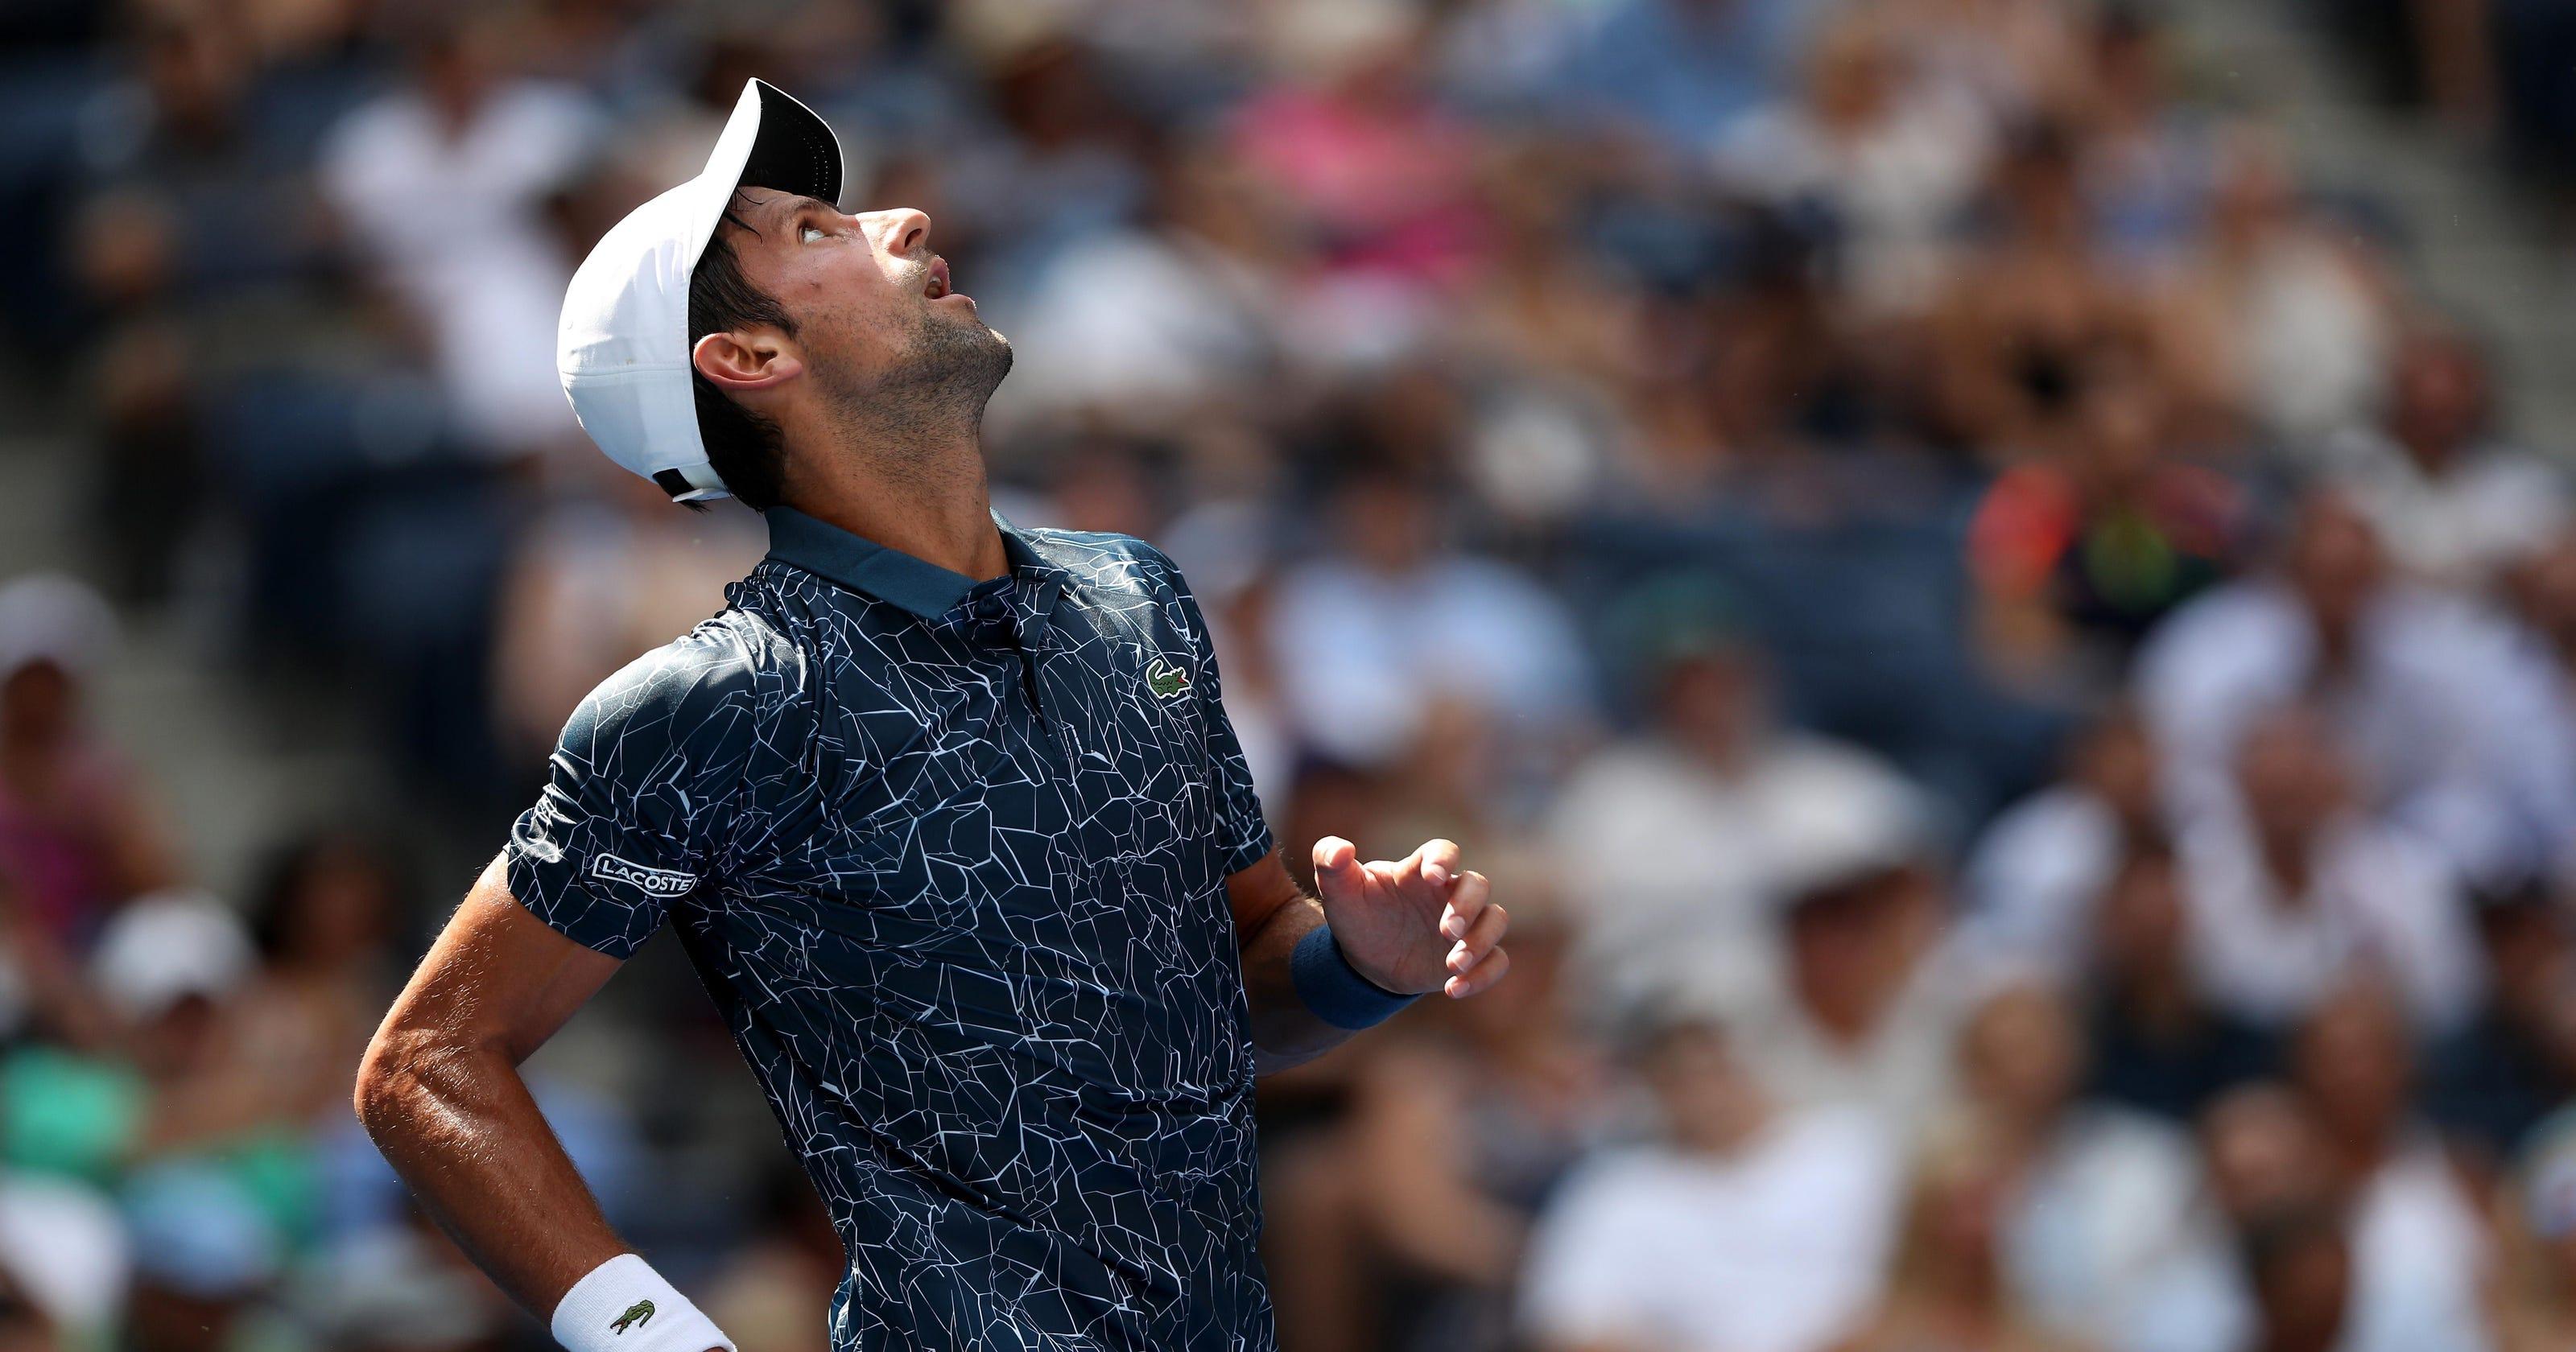 3c40ed2c3a7d6 Djokovic in  survival mode  at U.S. Open  Federer wins